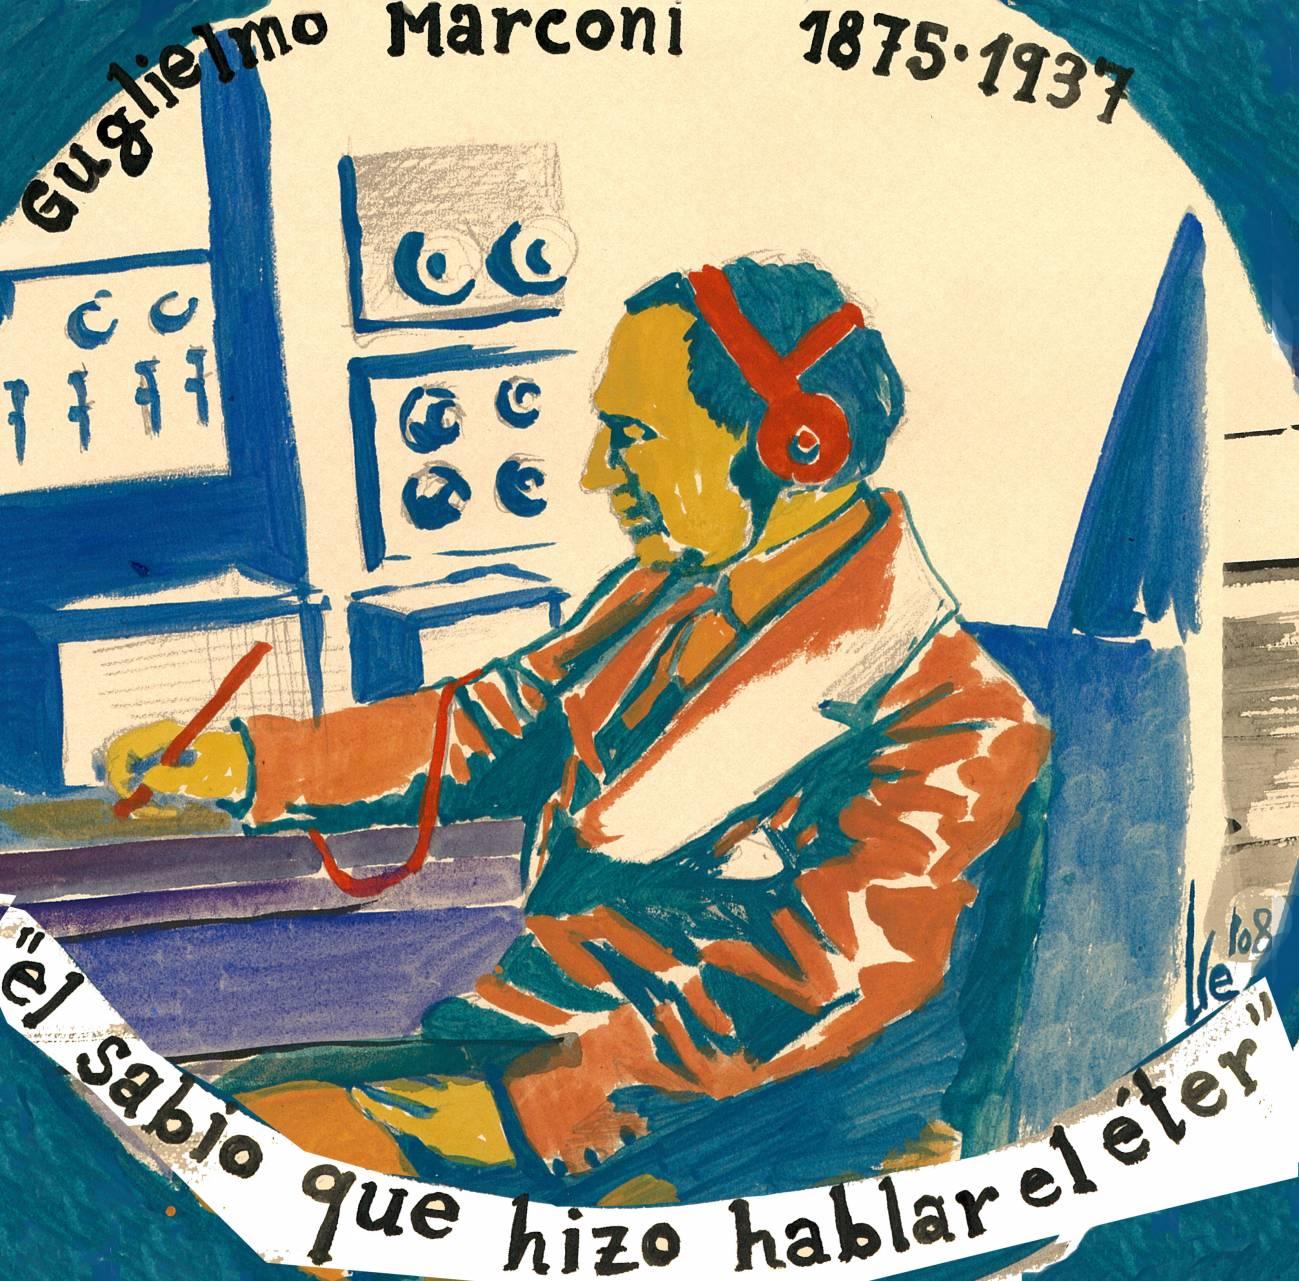 110 Aniversario: el 13 de julio de 1898 Guglielmo Marconi patentó la radio